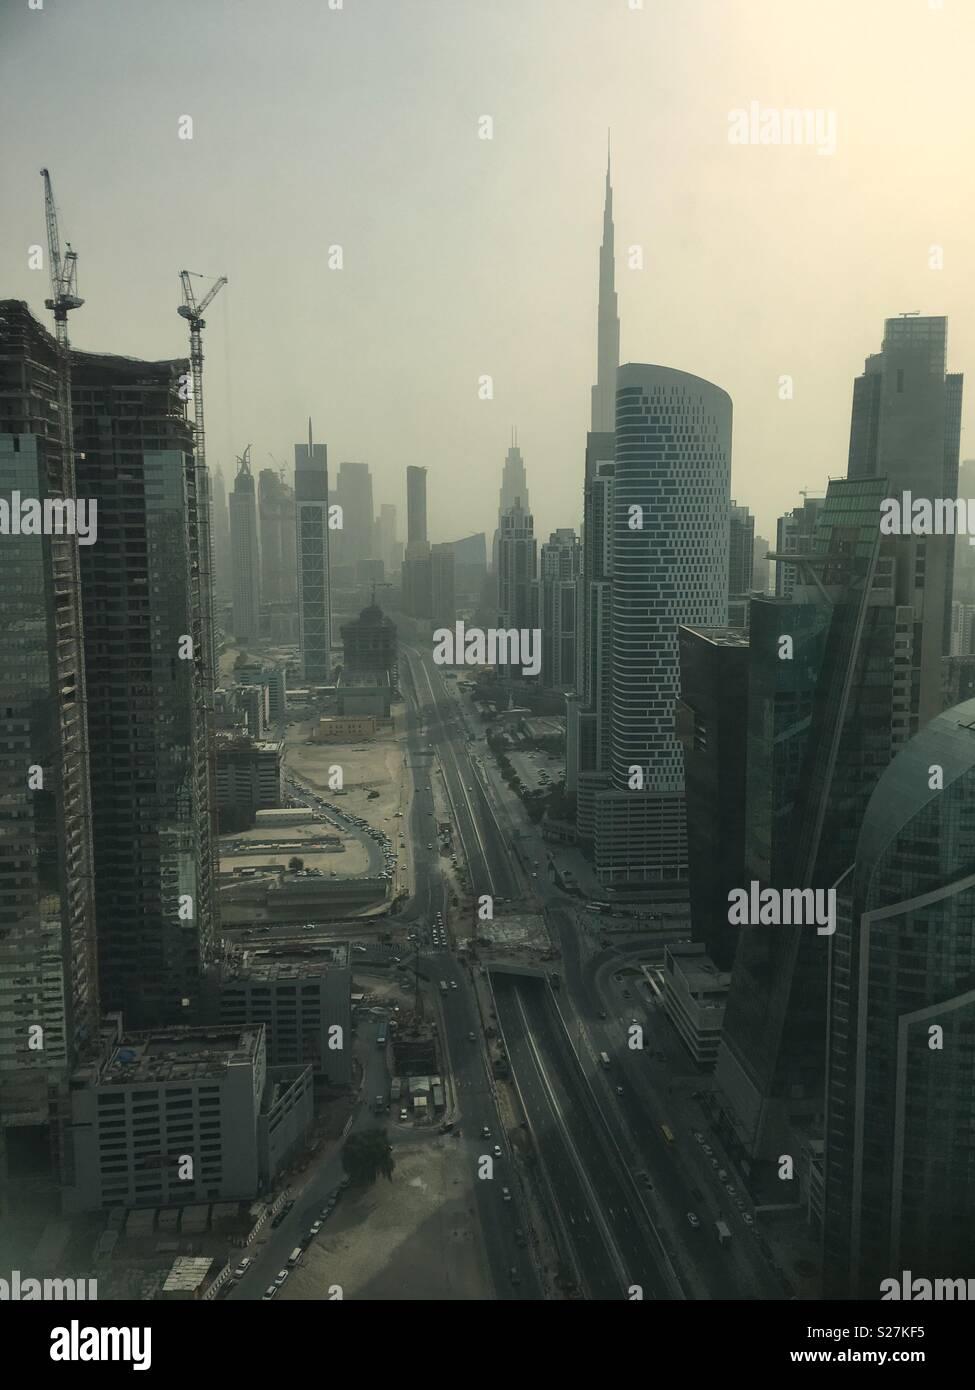 Dubai sky scrapers. - Stock Image